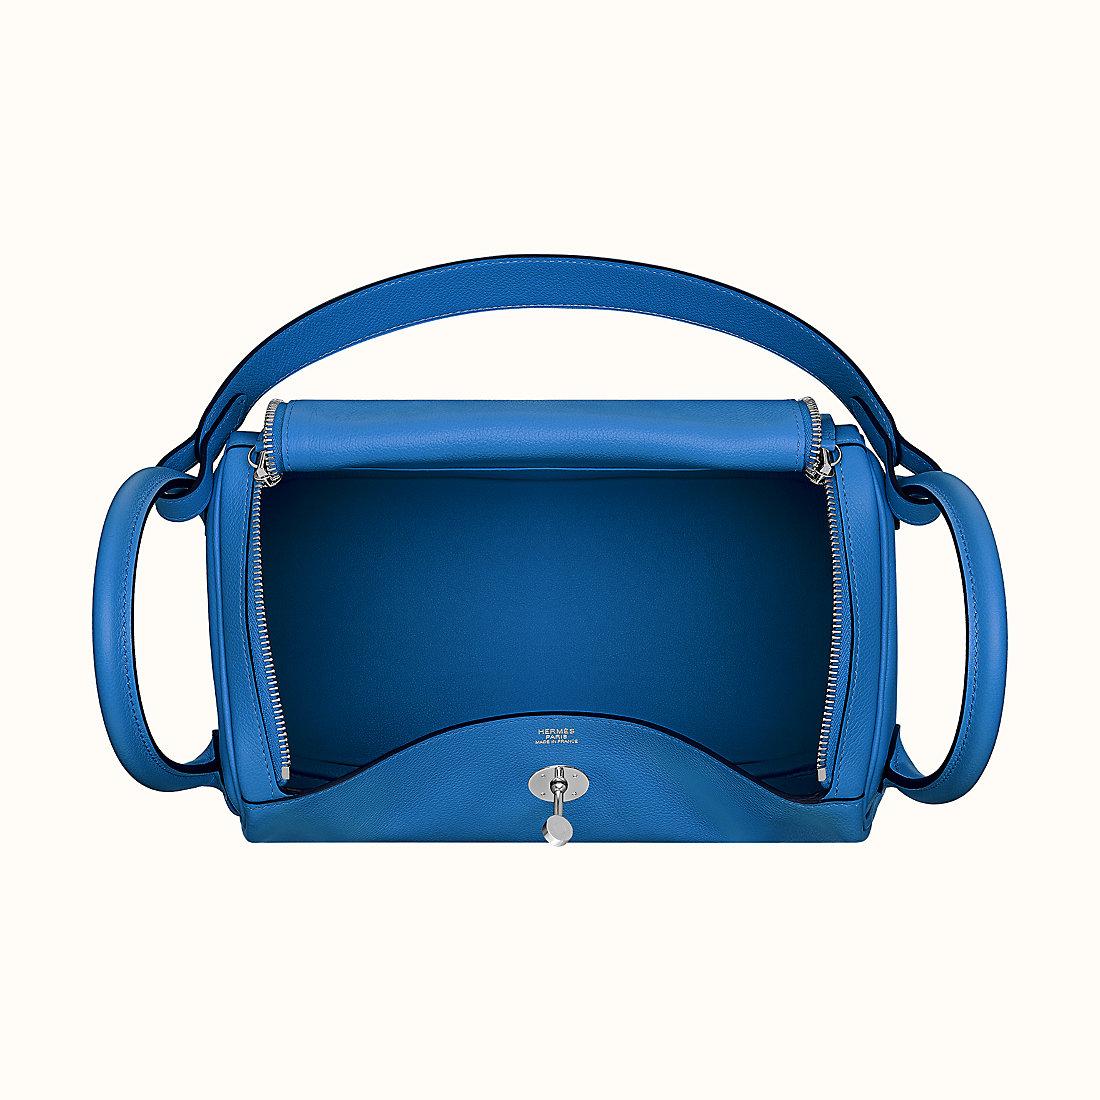 Tai Po, Tai Po District, Hong Kong Hermes Lindy 30 I7 Blue zellige Evercolor